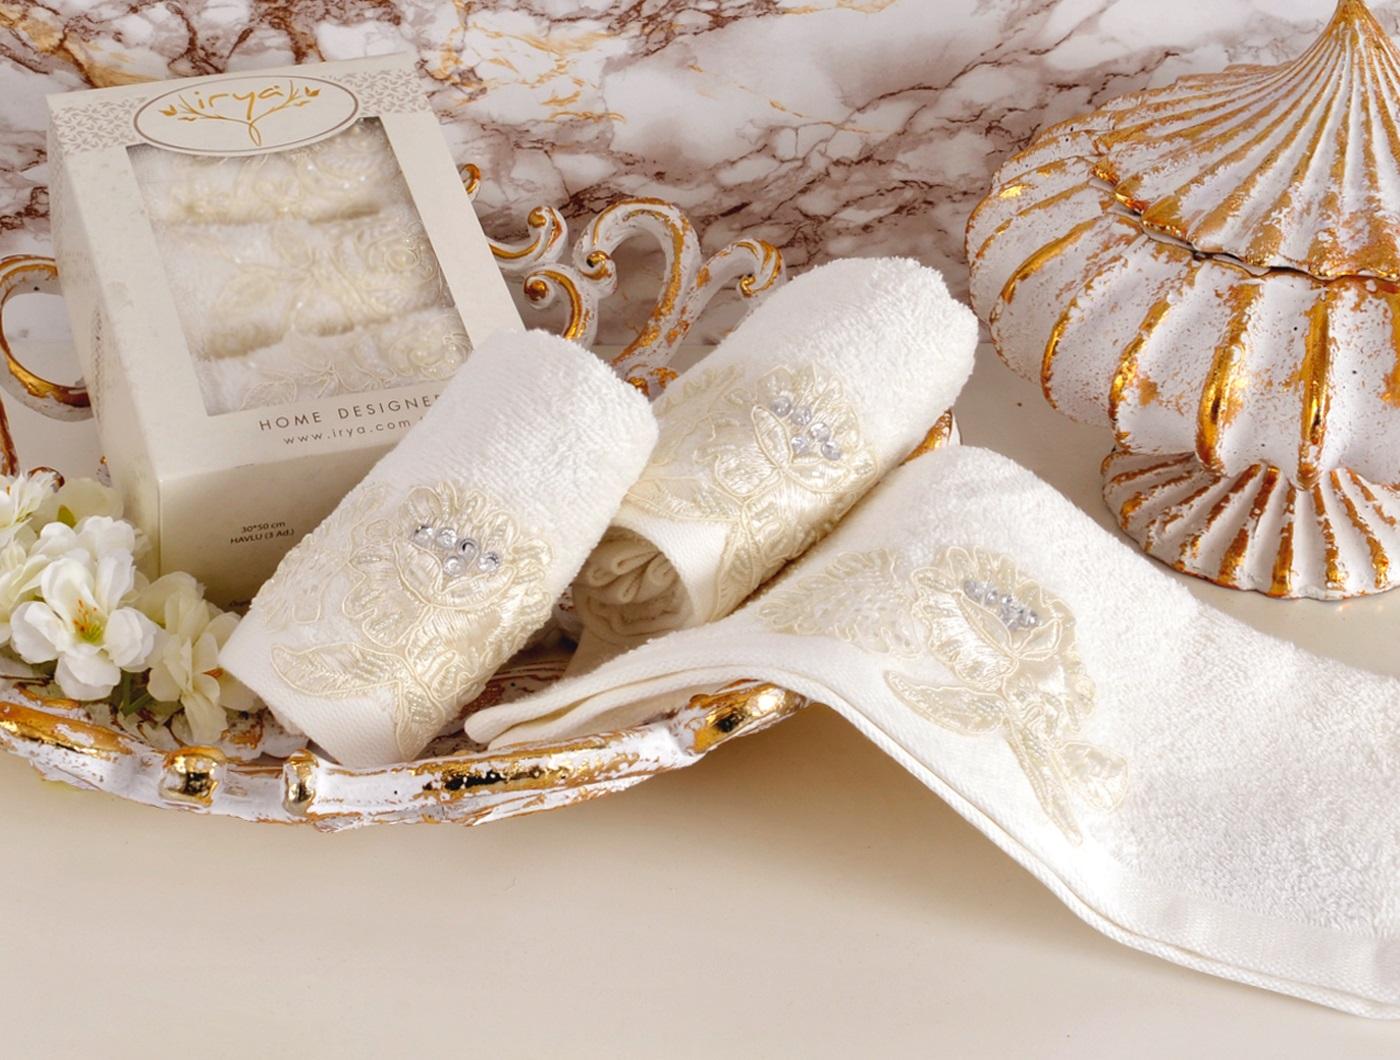 Купить Полотенца IRYA, Полотенце Show Цвет: Молочный (30х50 см - 3 шт), Турция, Бежевый, Махра